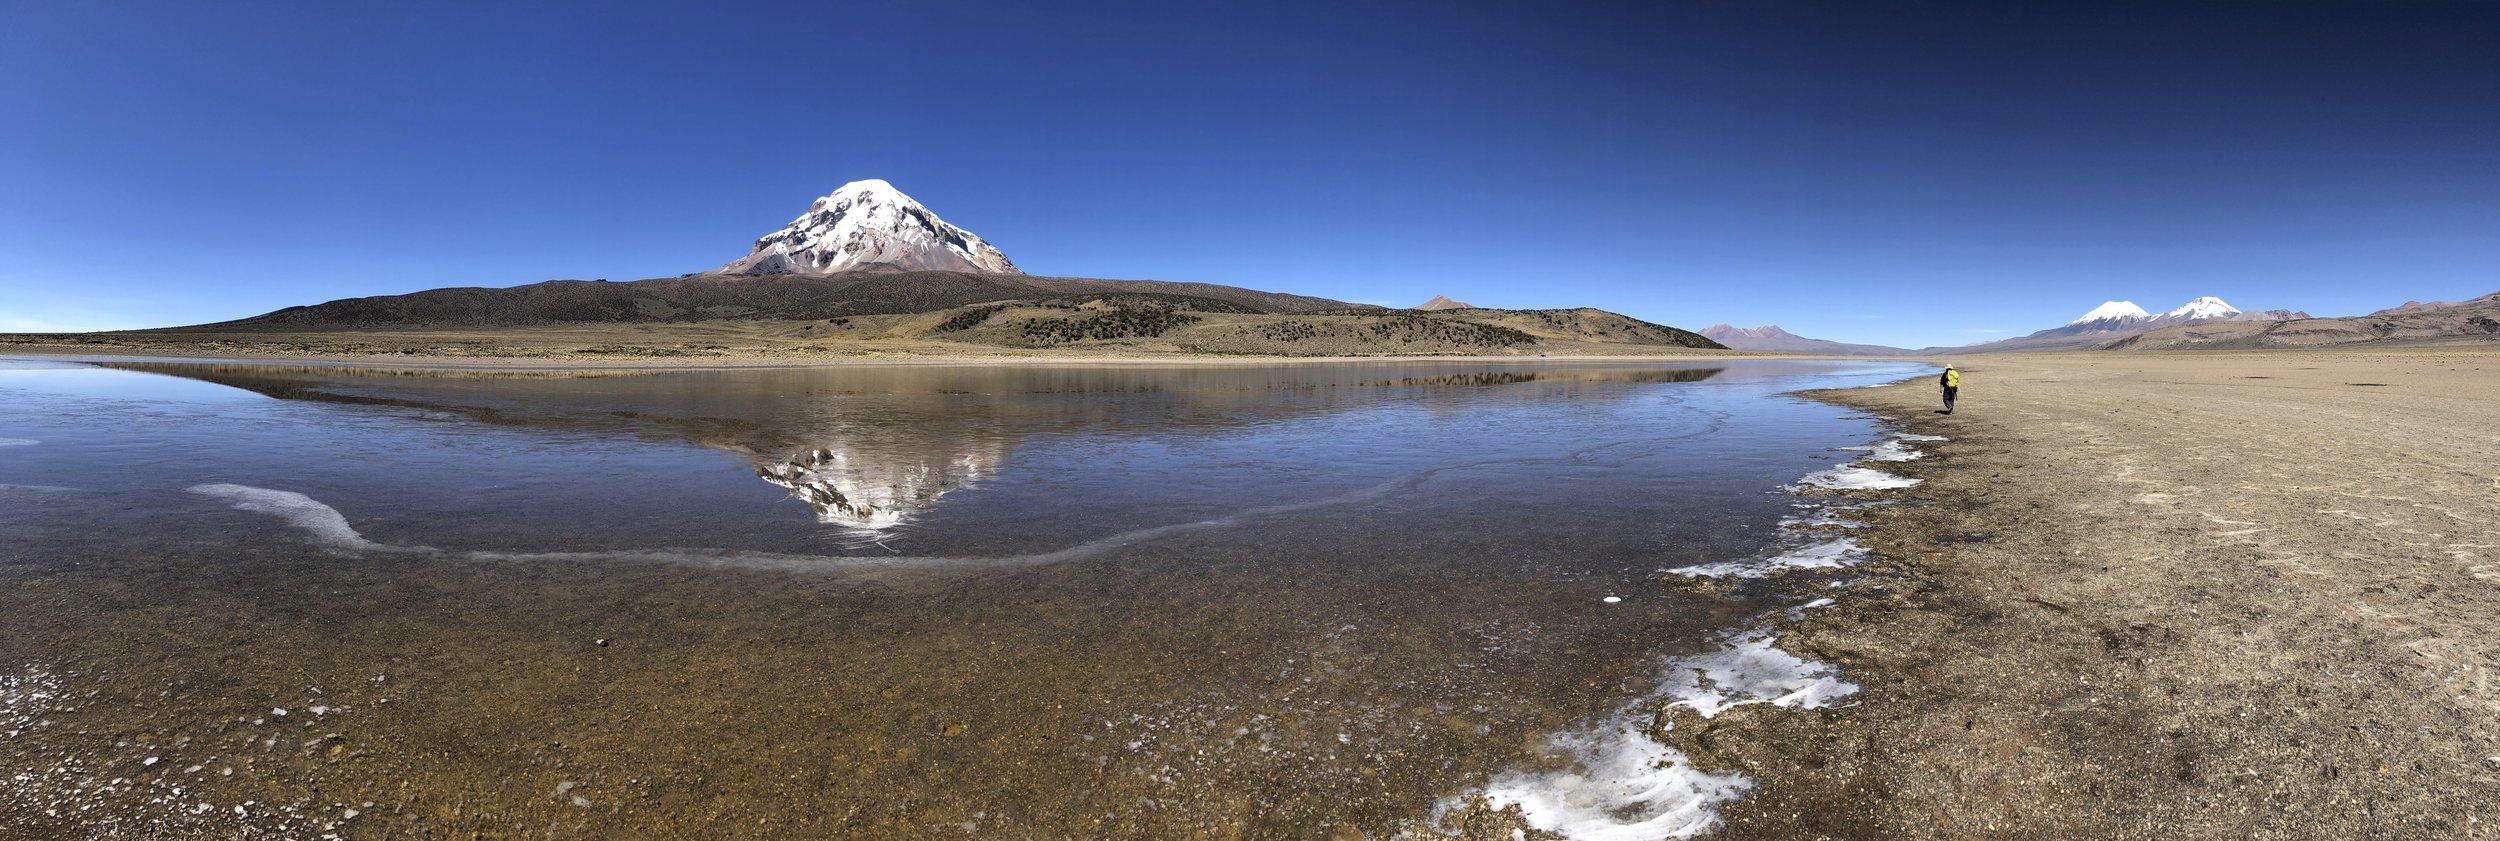 Sajama - the highest peak in Bolivia